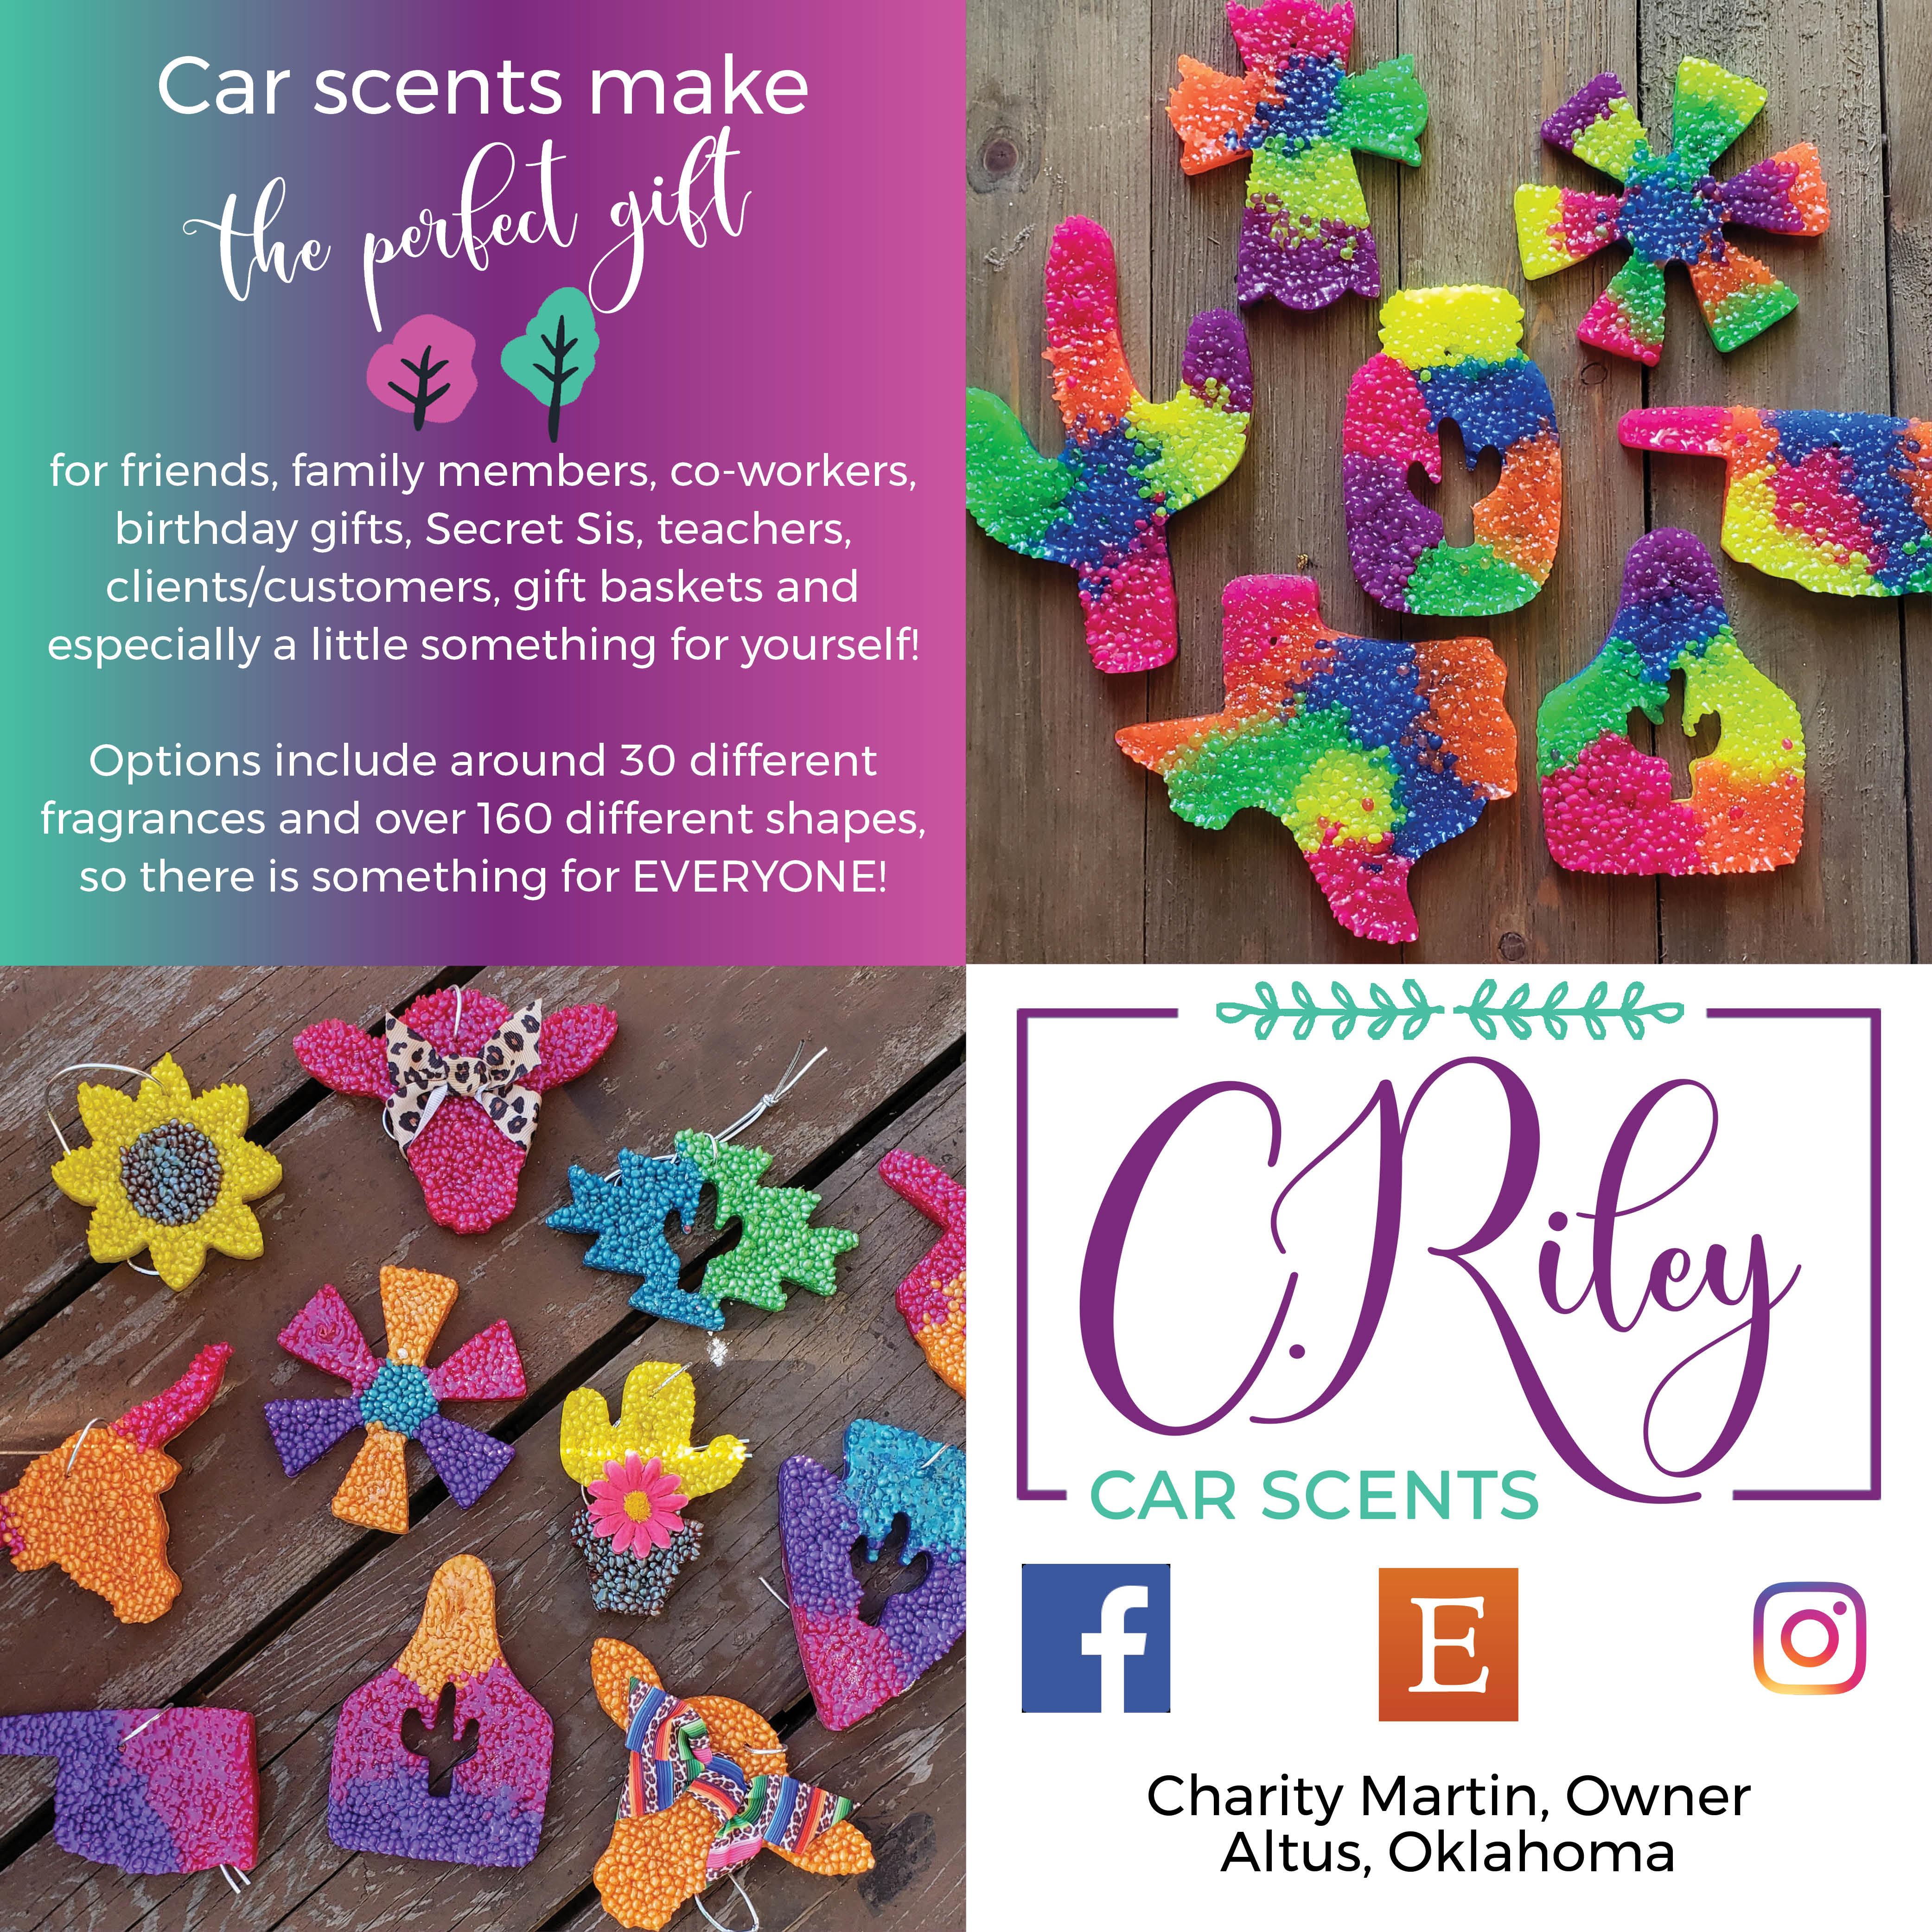 C. Riley Car Scents